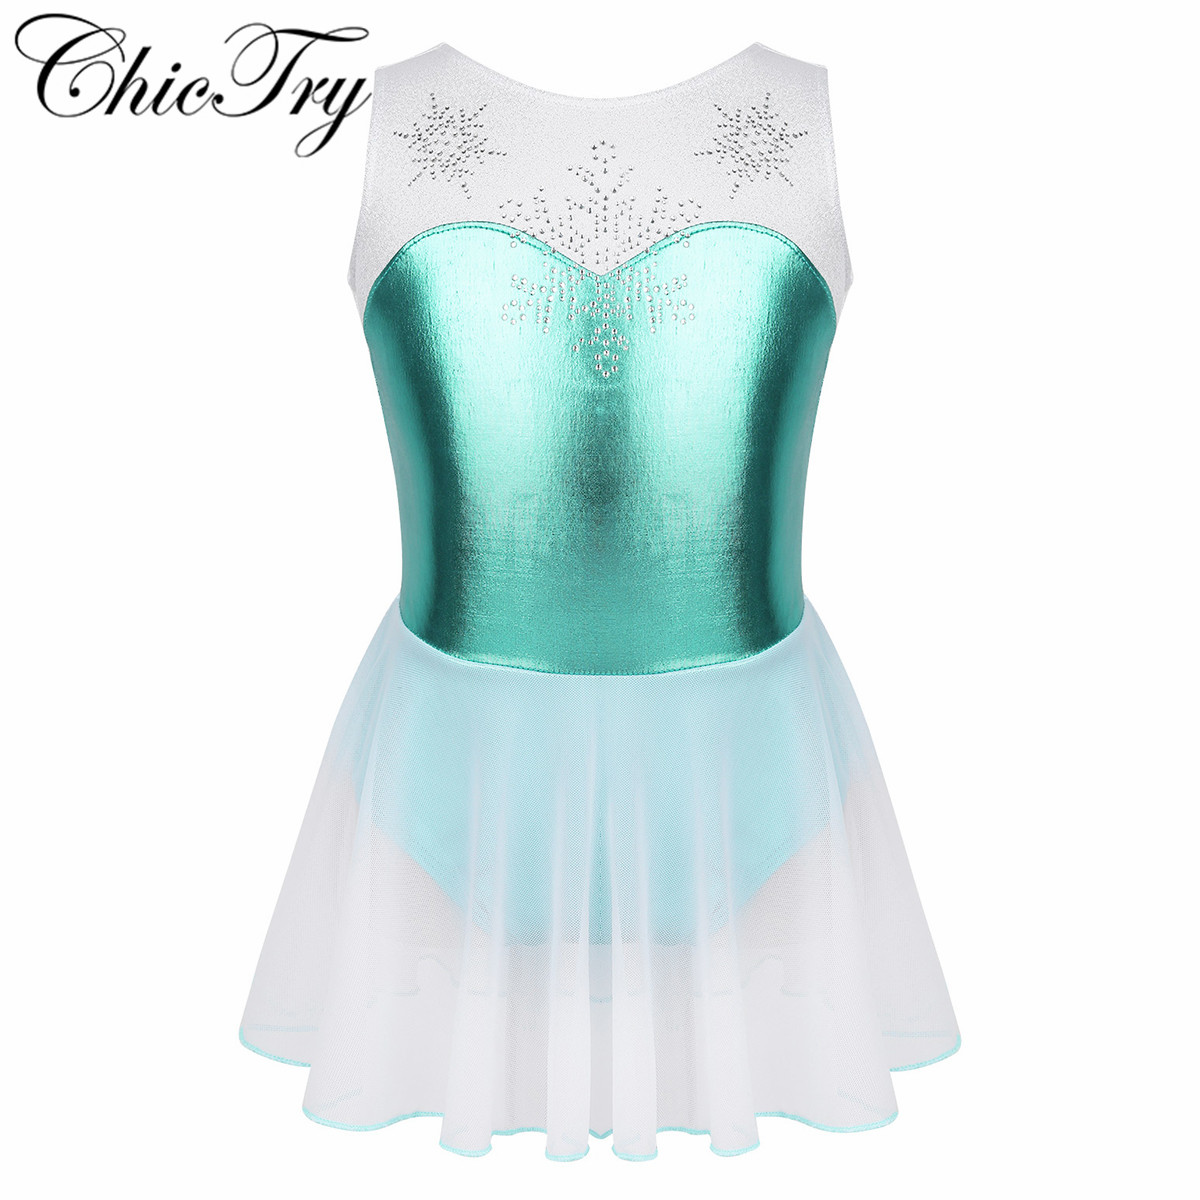 Kids Girls Dancewear Costume Sleeveless Shiny Rhinestone Snowflake Metallic Bodice Ballet Dance Gymnastics Leotard Tutu Dress